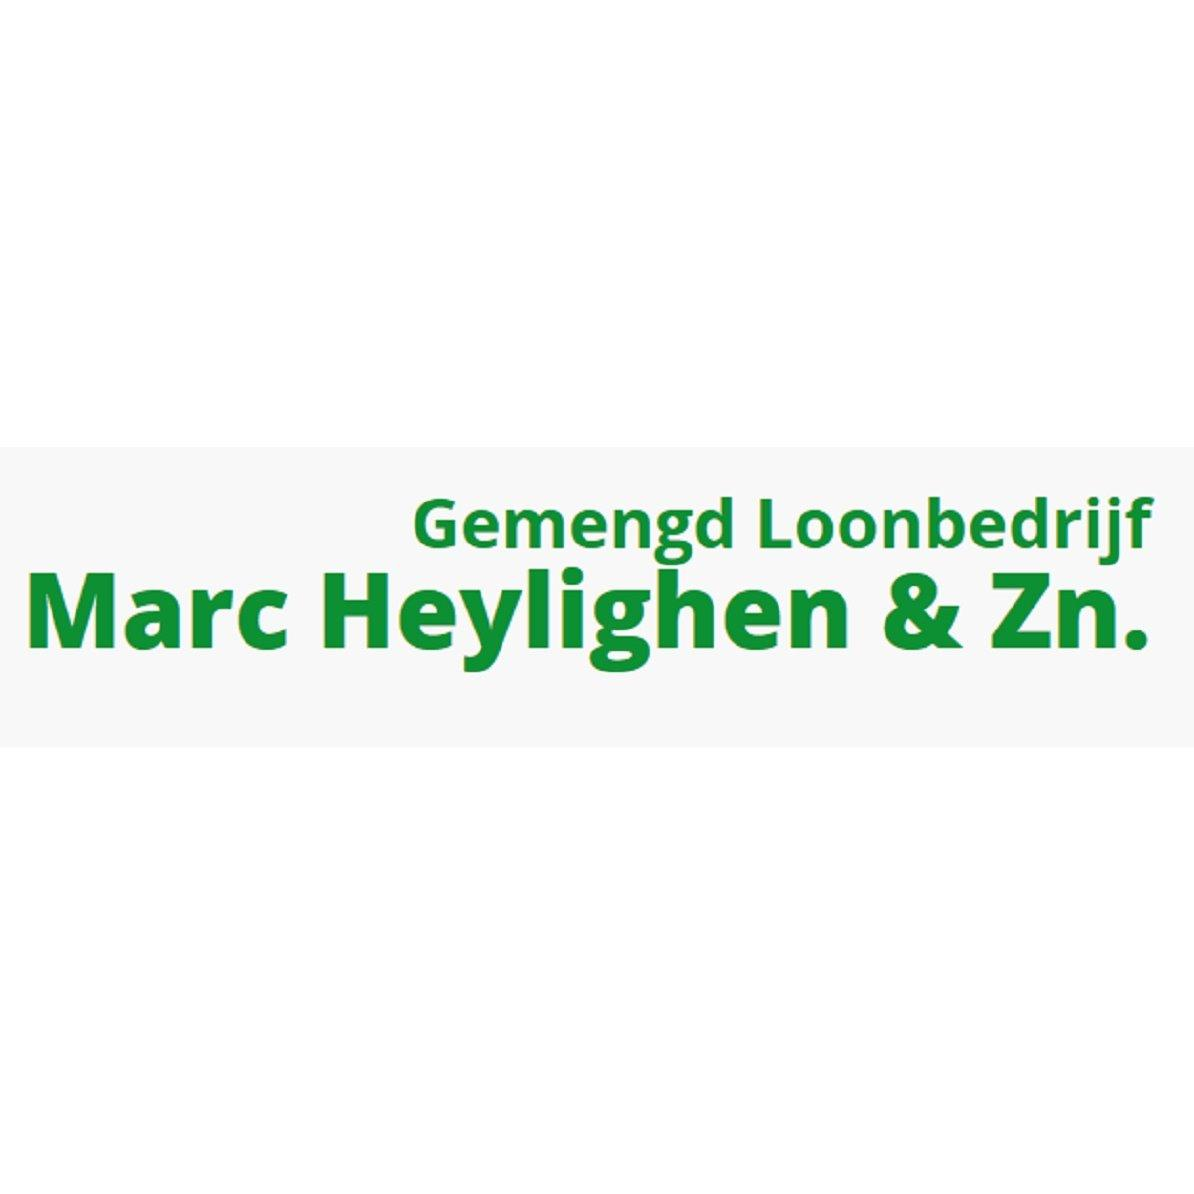 Marc Heylighen & Zn